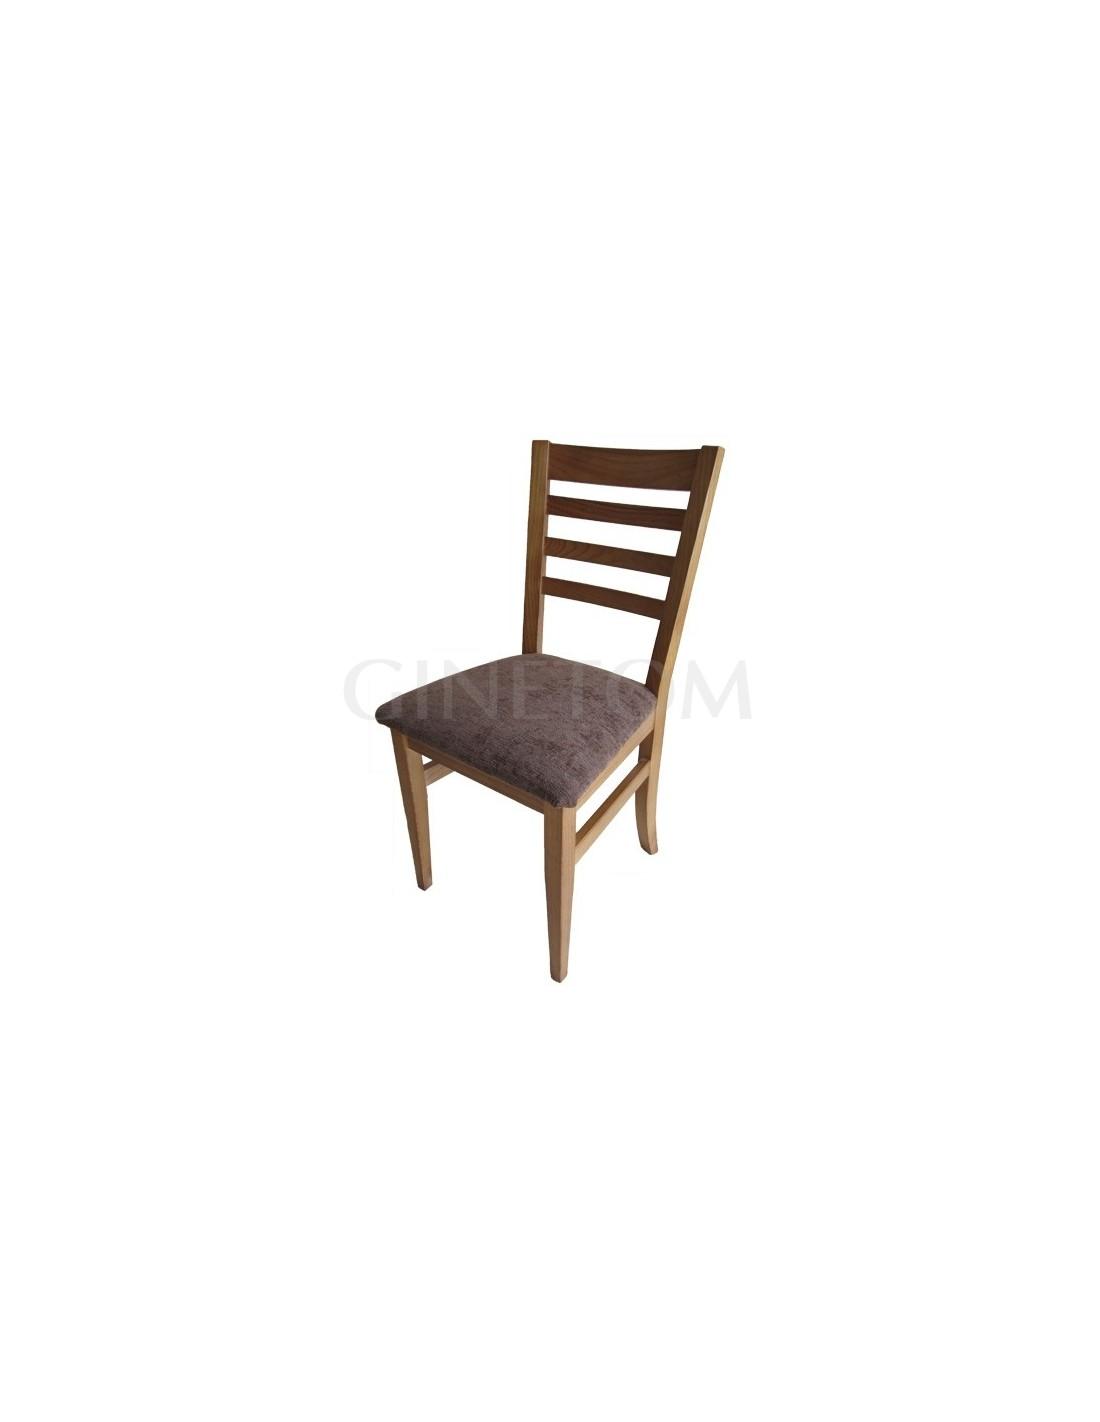 Sillas de madera ref 631 sillas hosteler a de ginetom for Sillas hosteleria